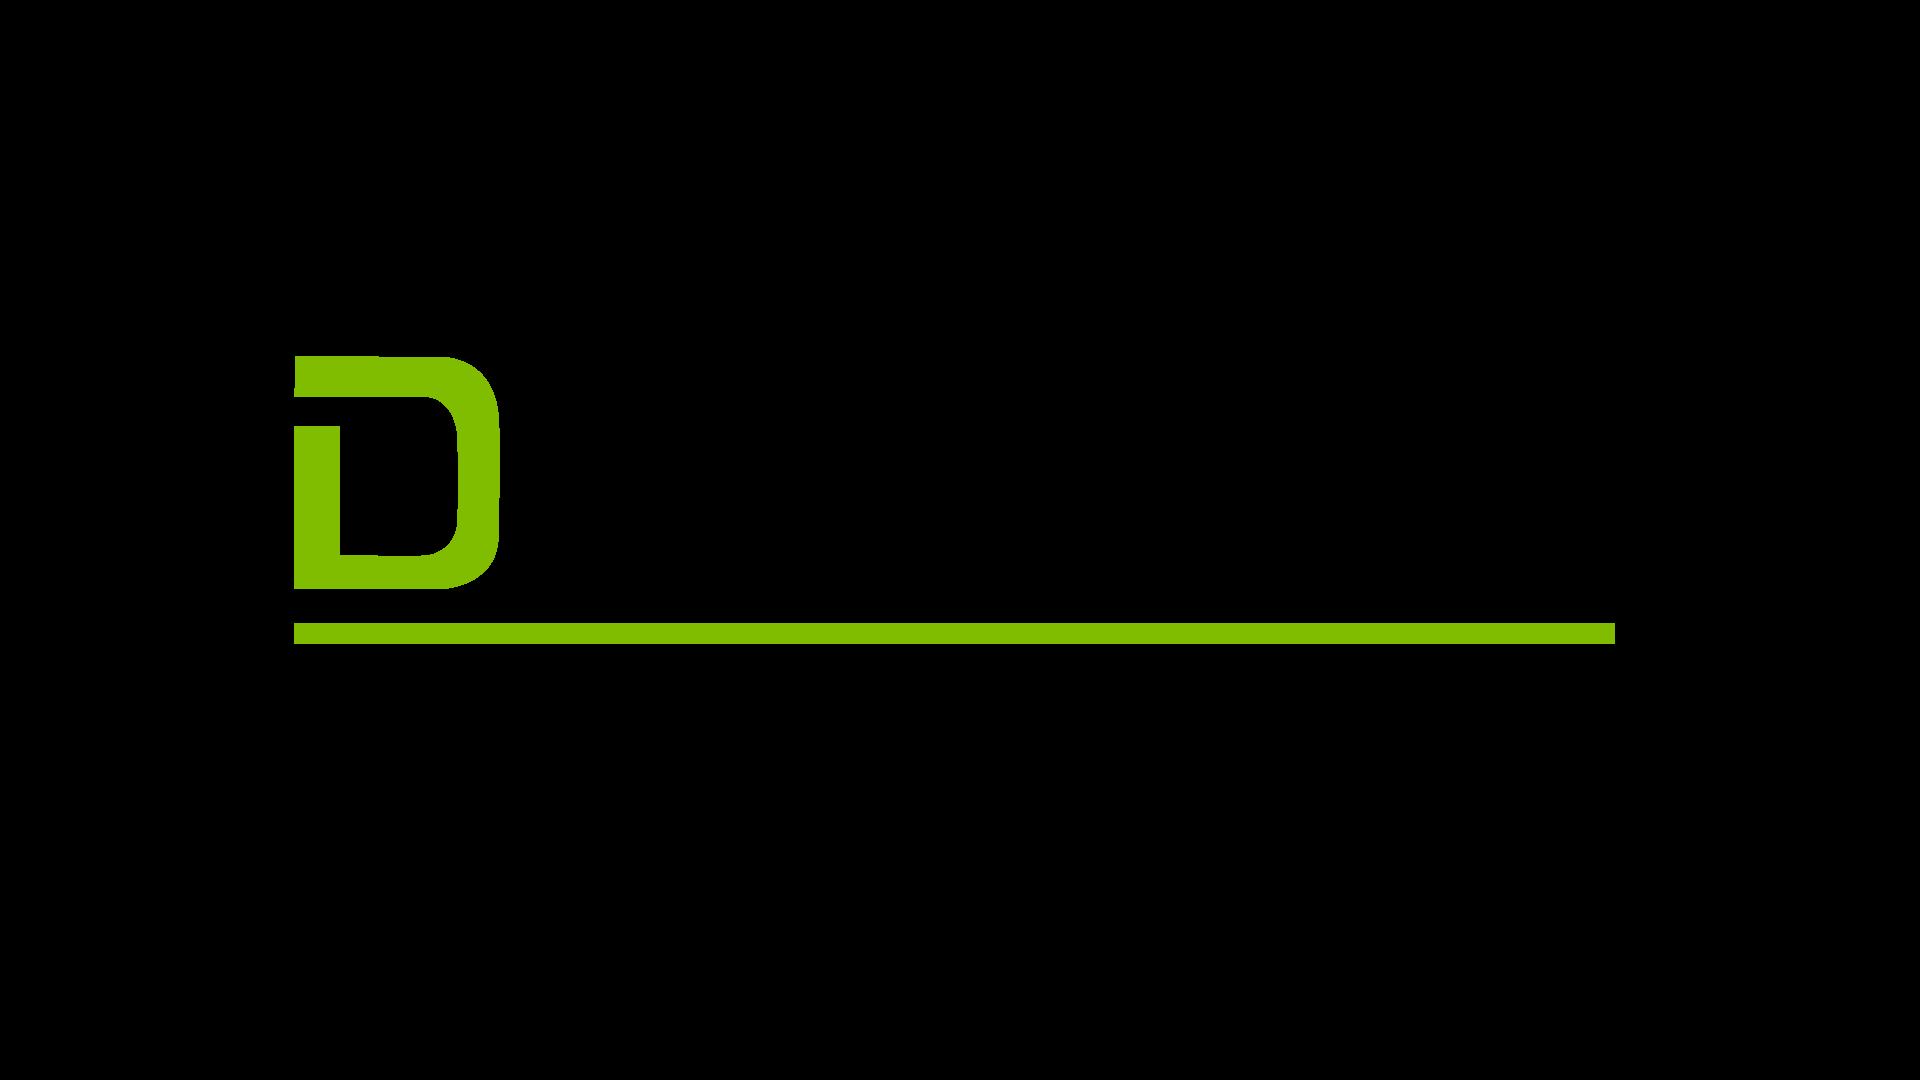 dpantv-logo-1080-b.png